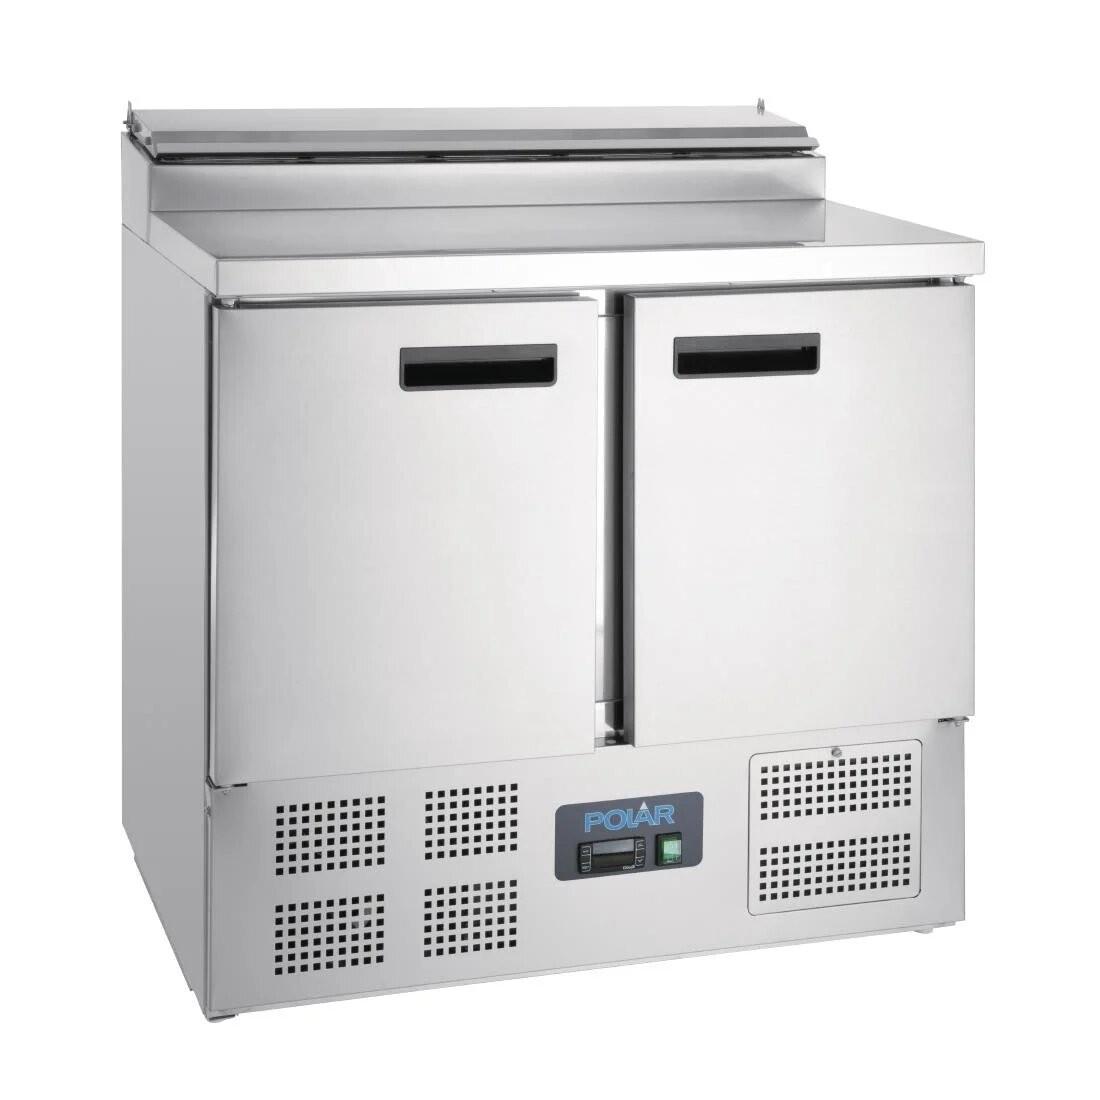 Polar G604 G-Series Two Door Pizza Prep Counter Fridge - 254 Litres